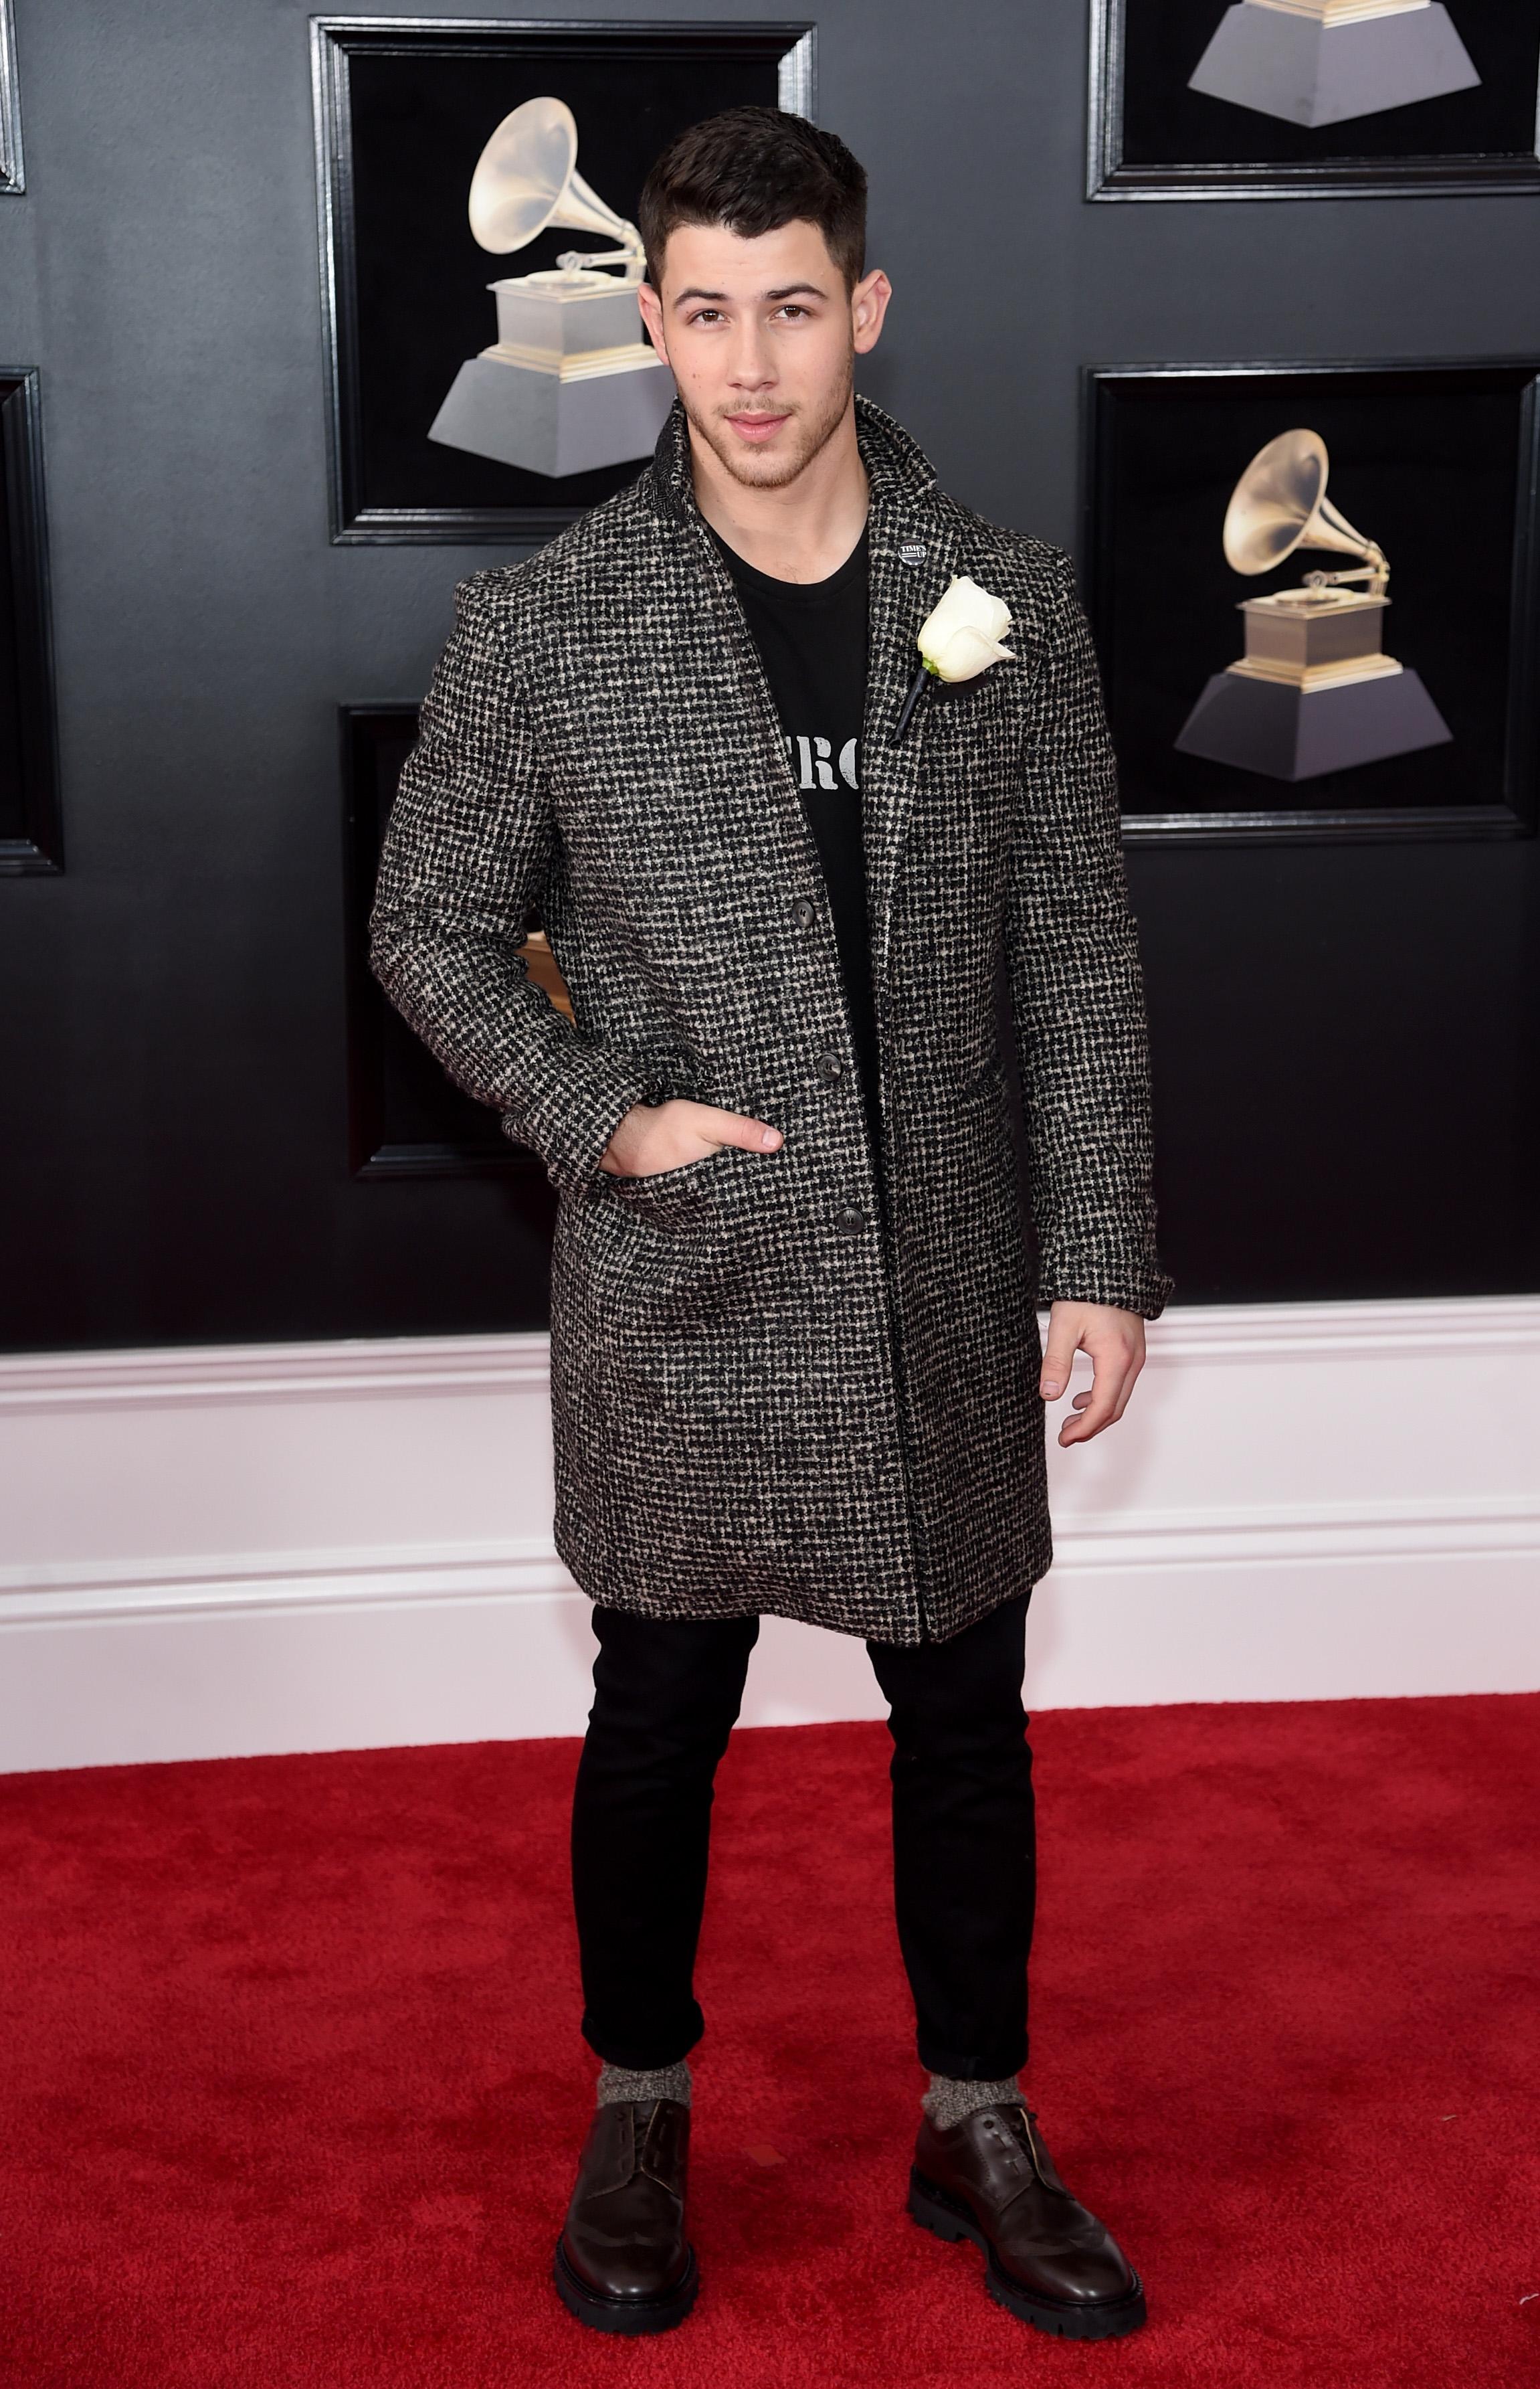 Nick-Jonas-Says-Theres-No-Jonas-Brothers-Band-Reunion-Planned